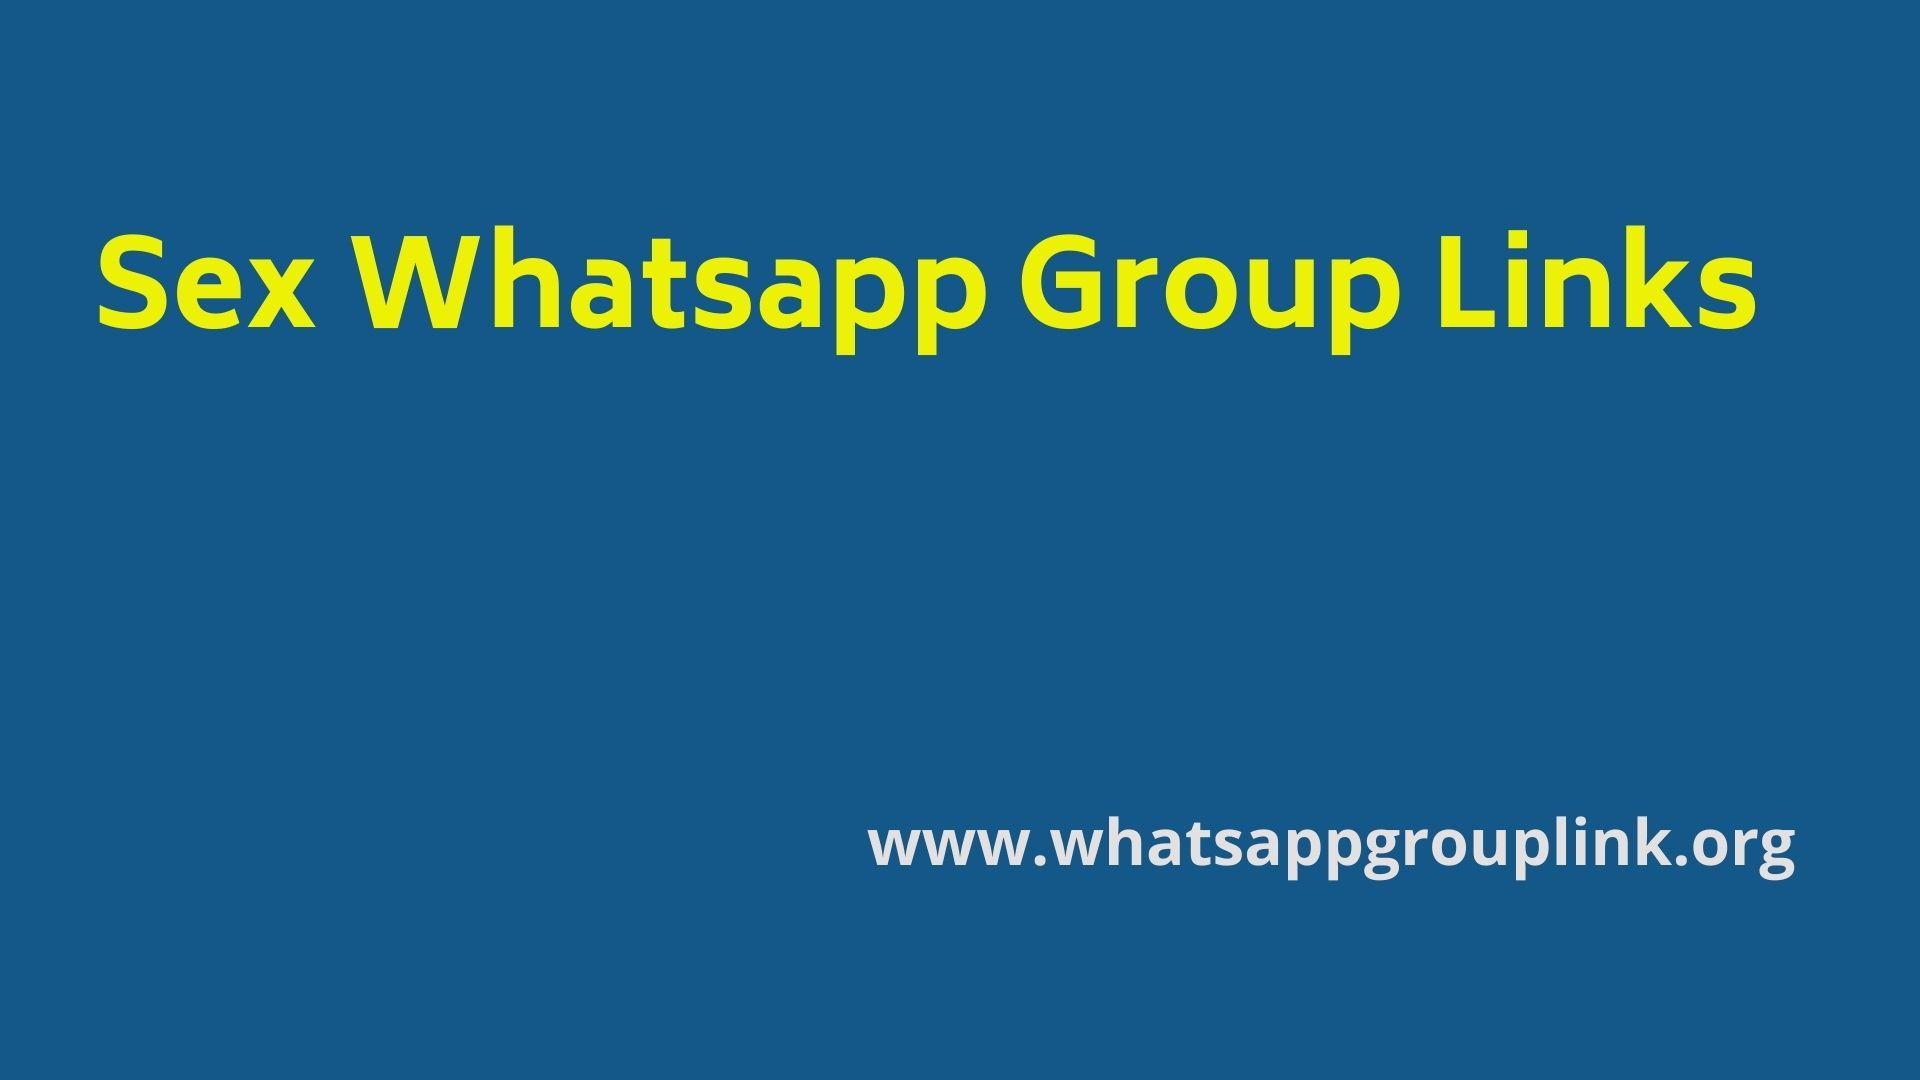 Sexy chat whatsapp Real WhatsApp